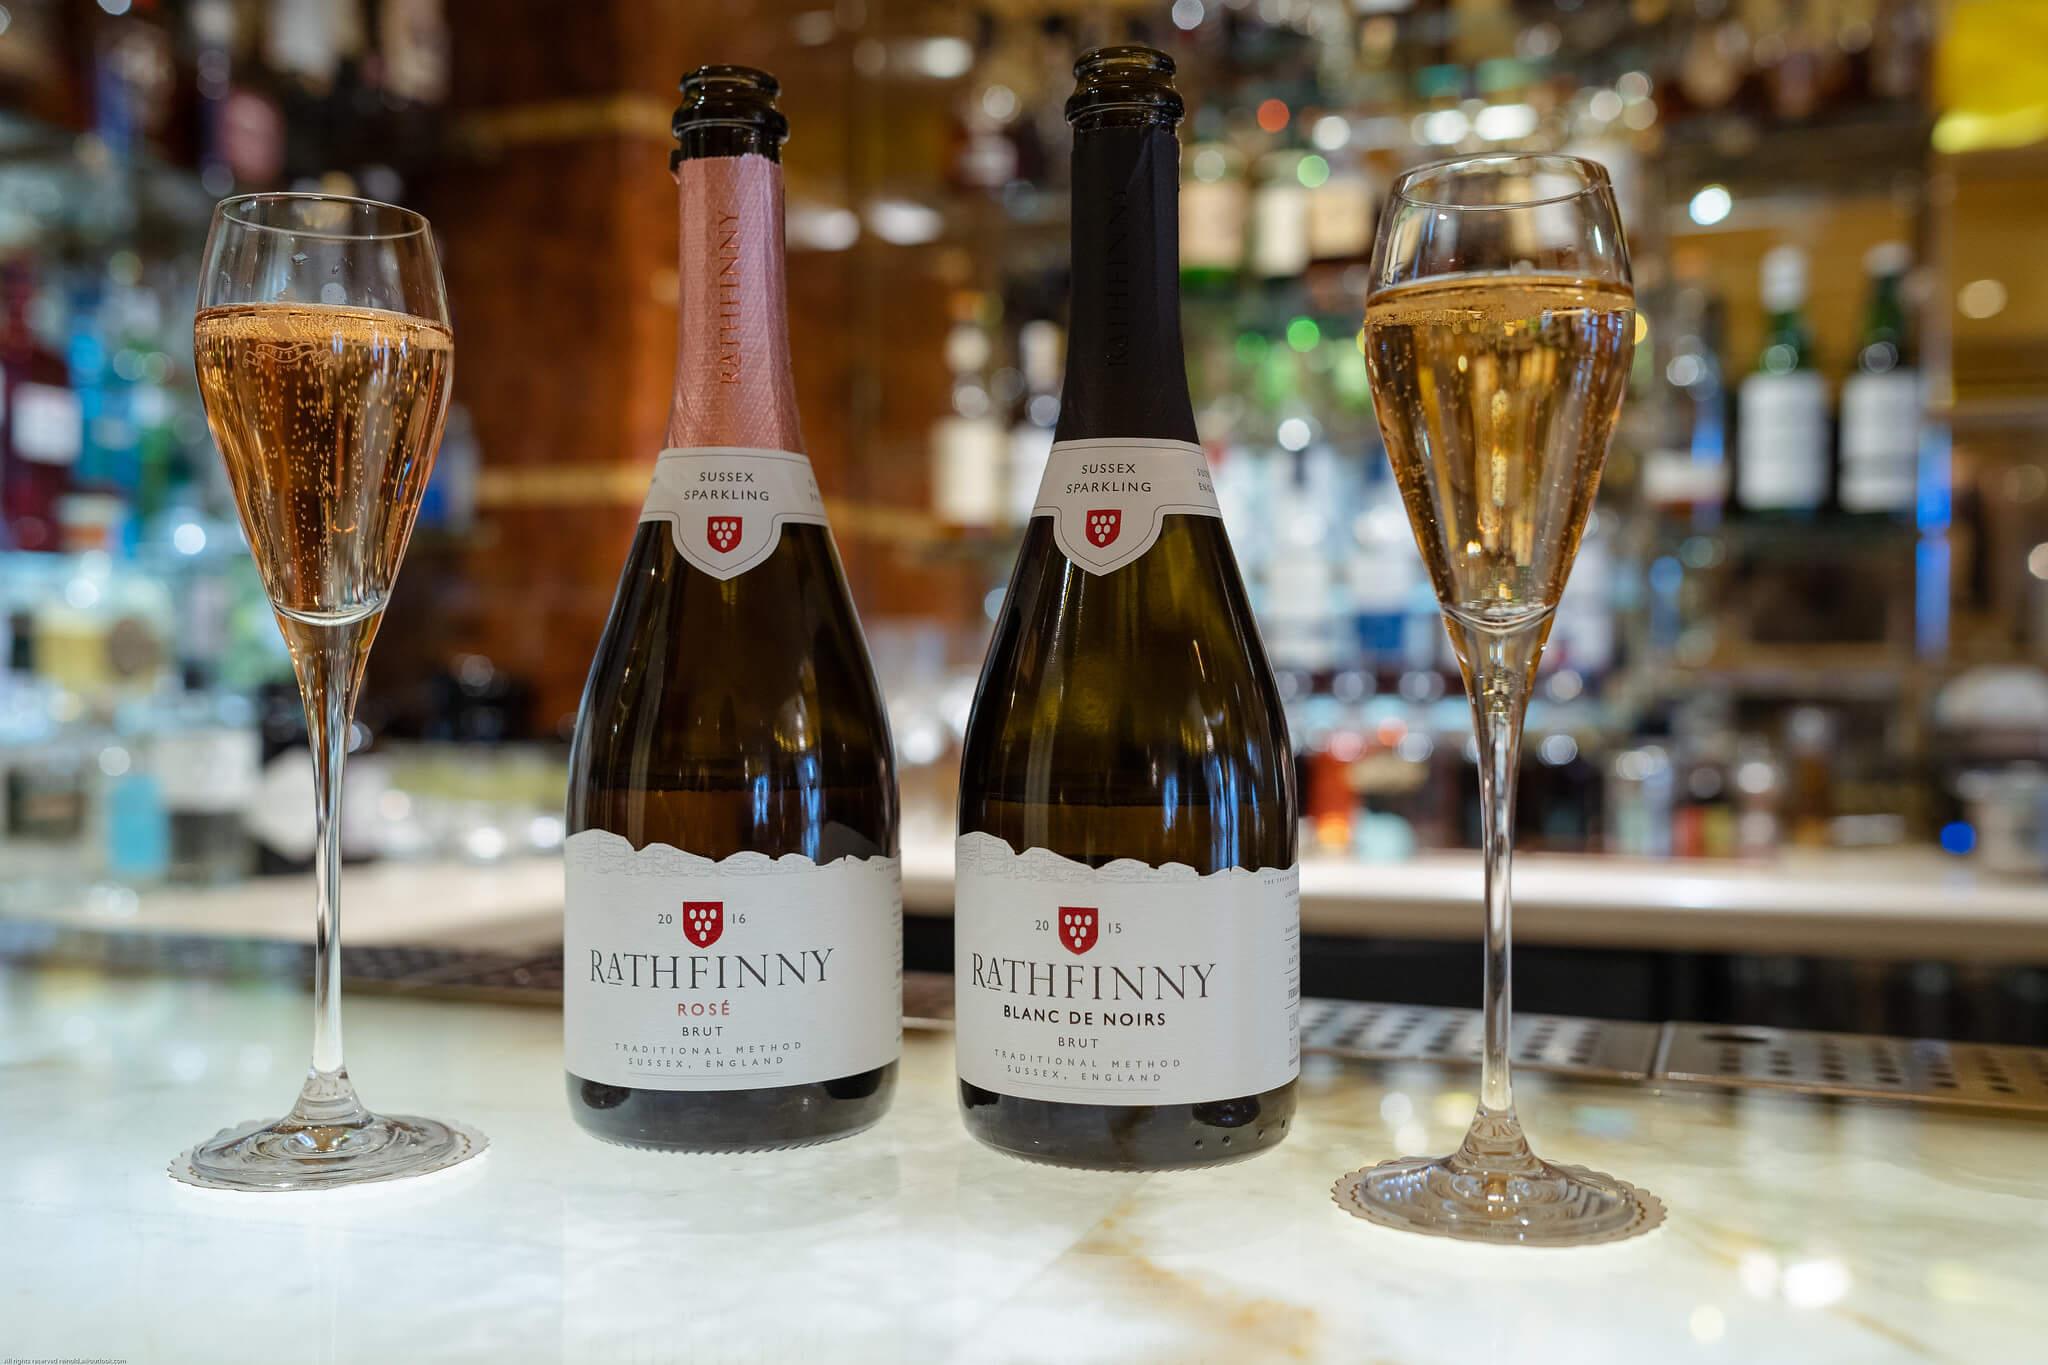 Rathfinny Sussex Sparkling Wine at the Ritz